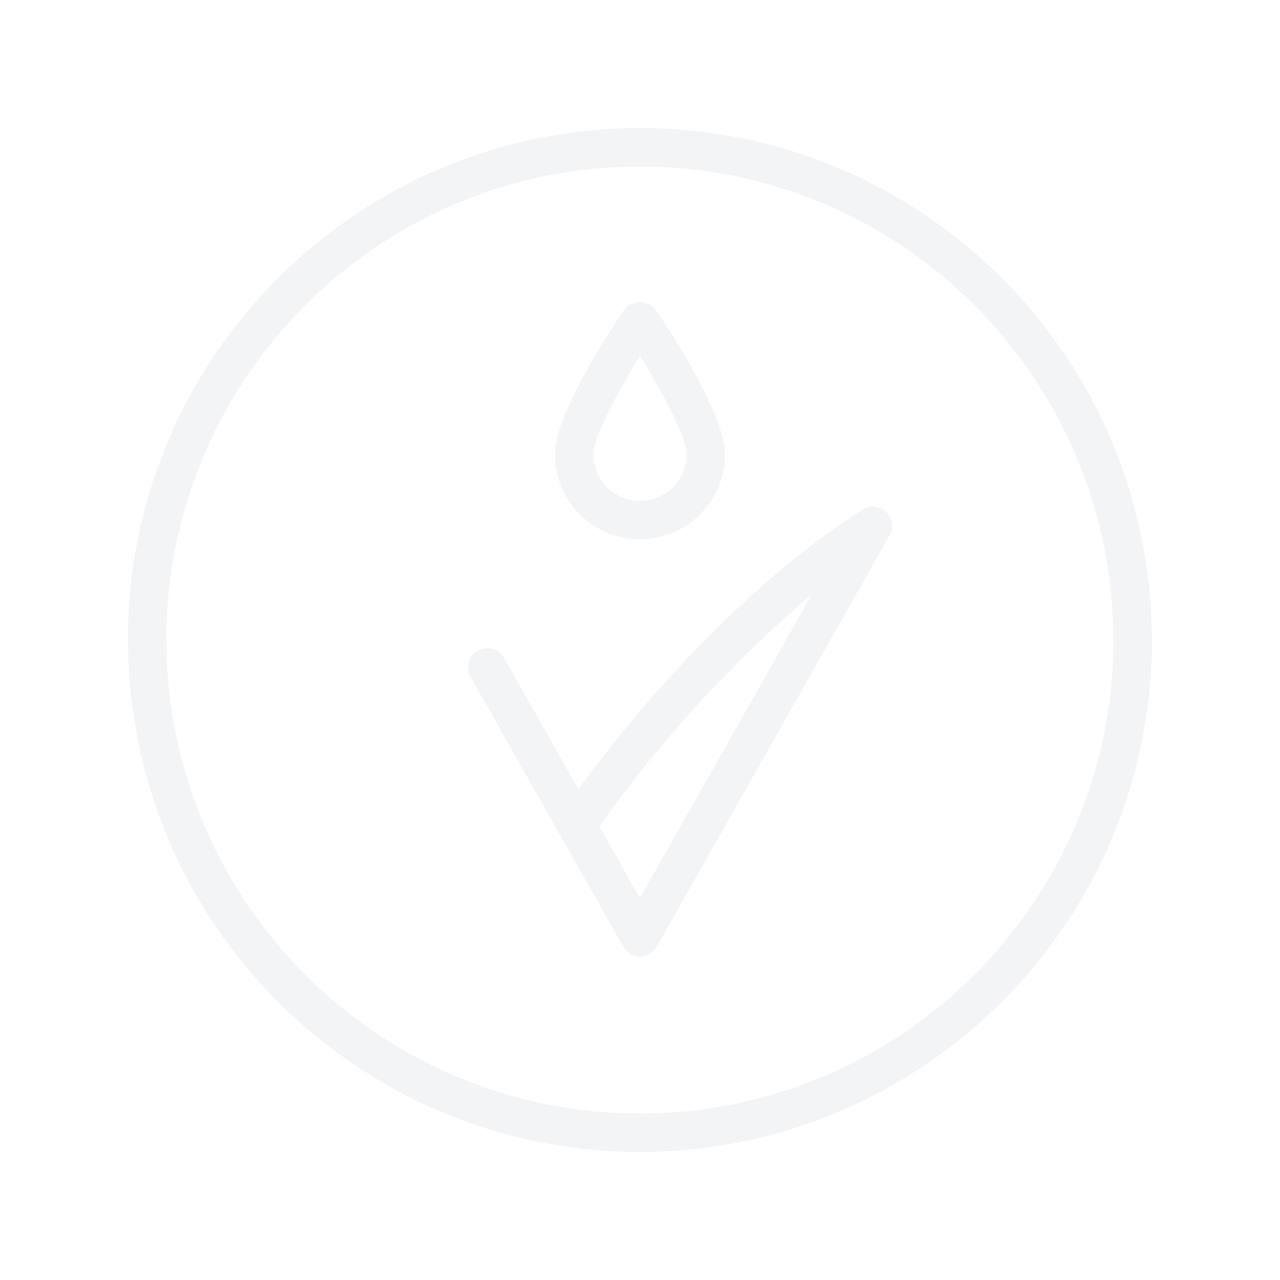 BIOKAP Nutricolor 5.0 Light Brown Permanent Hair Dye 140ml